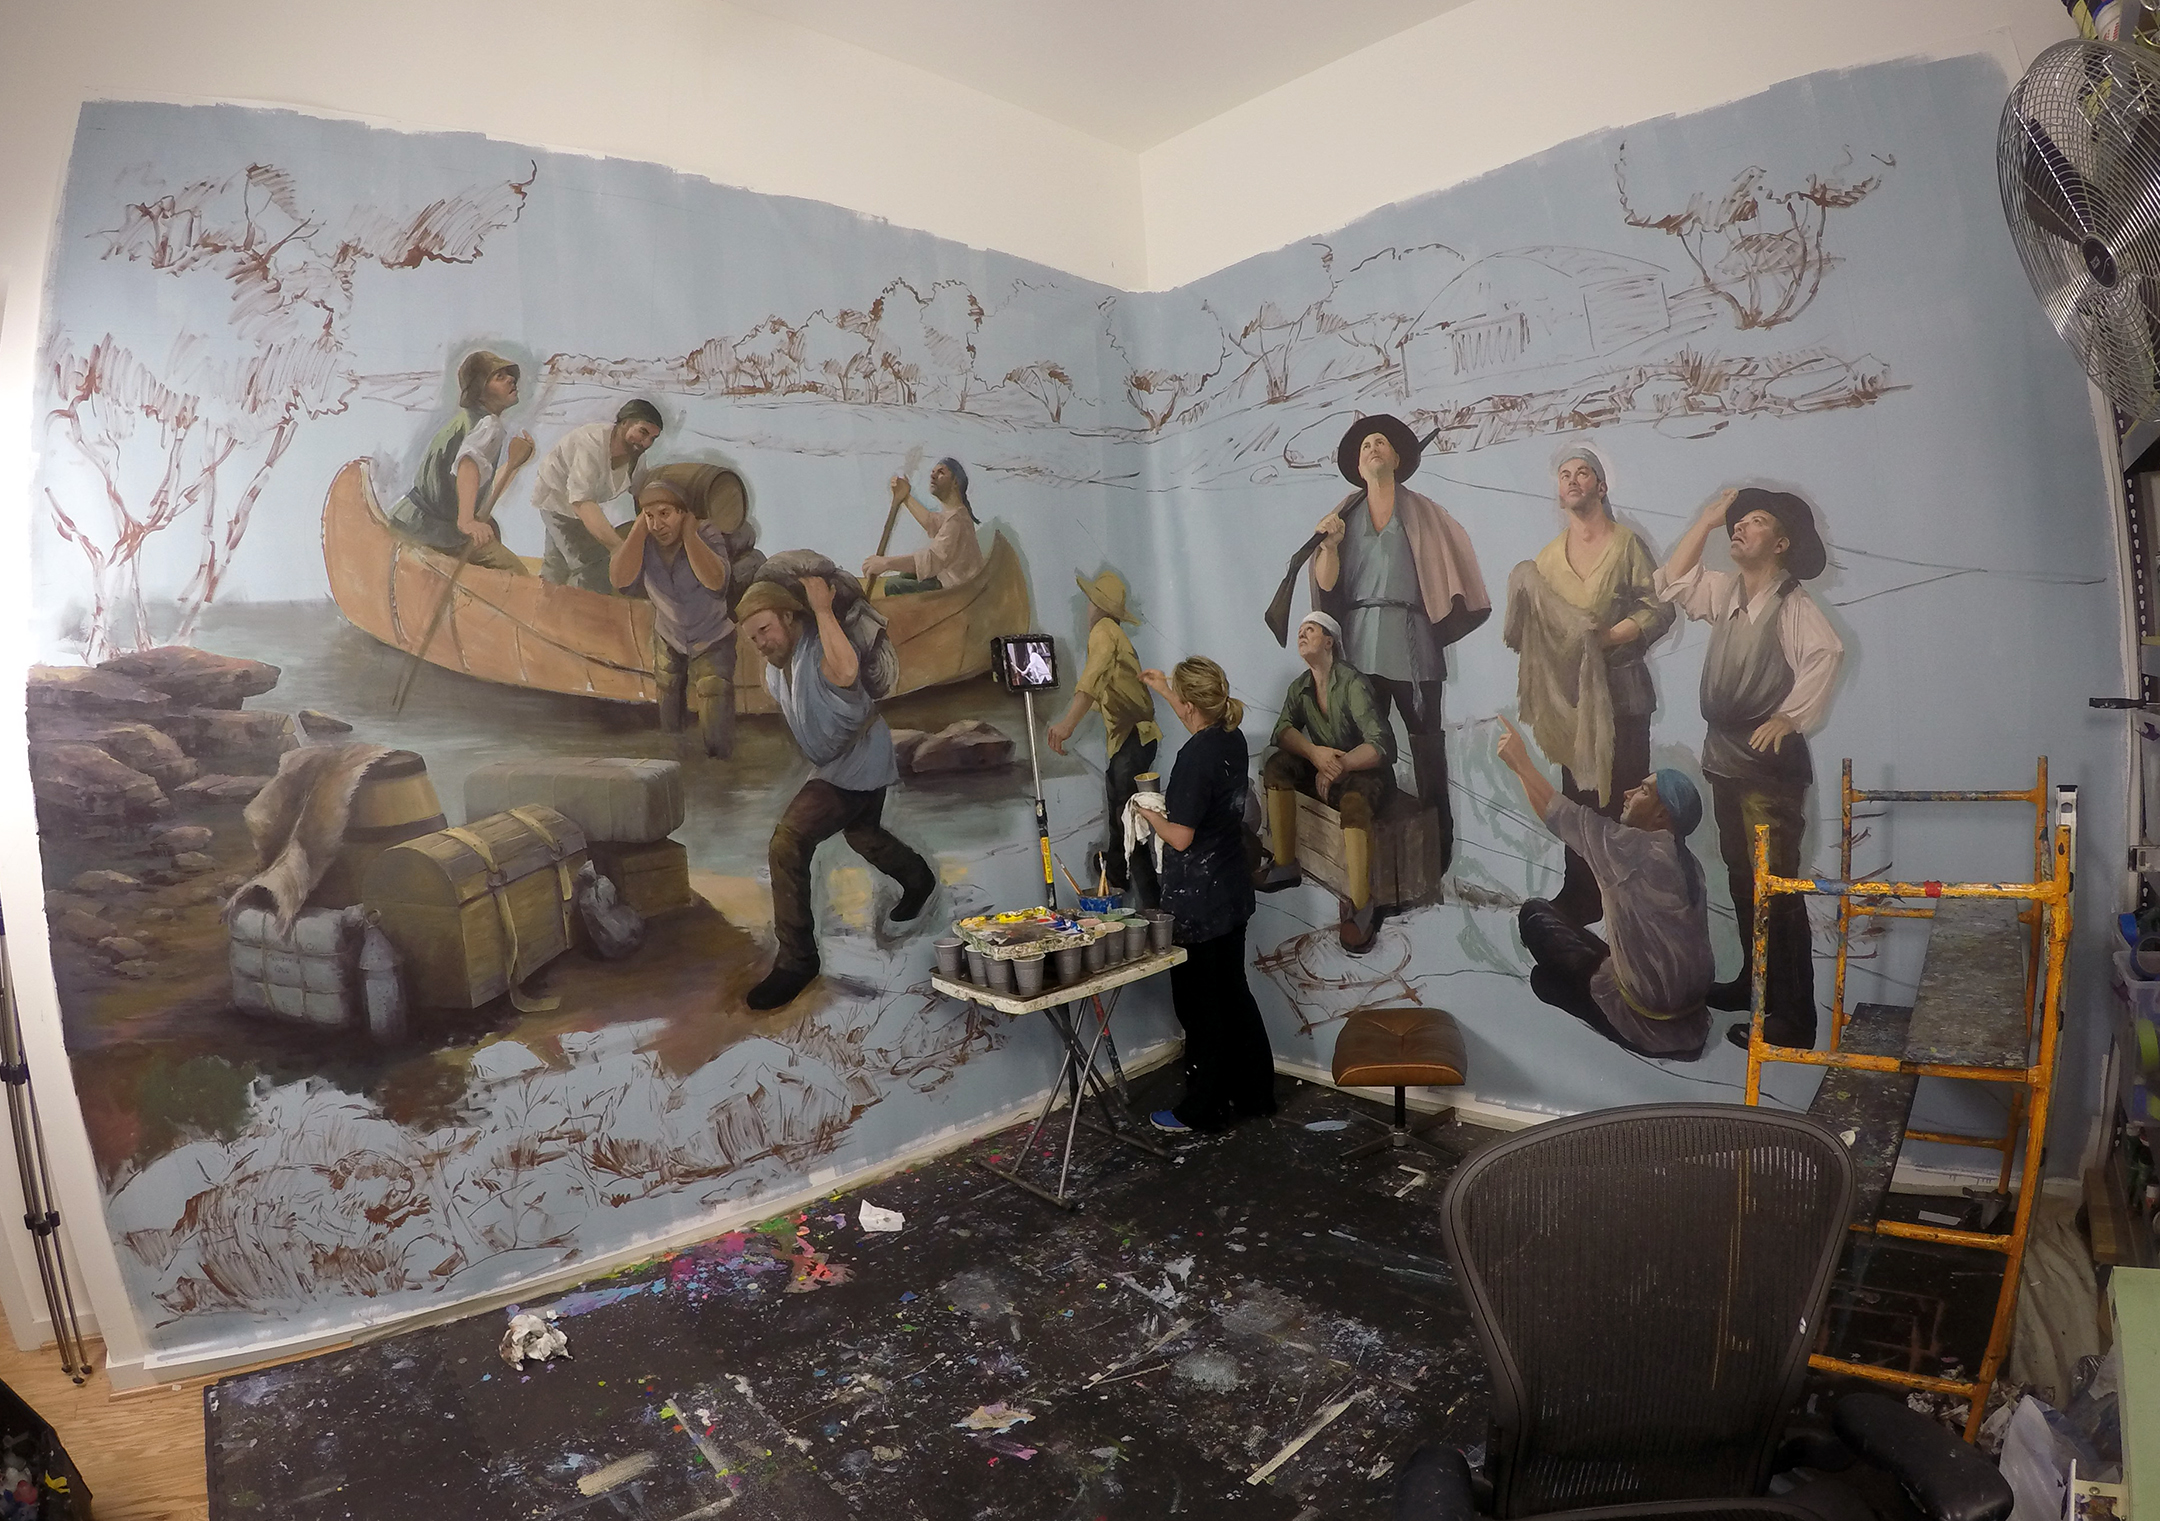 Progress Photo:Painting mural in Los Angeles Studio (bottom 1/2 of mural)